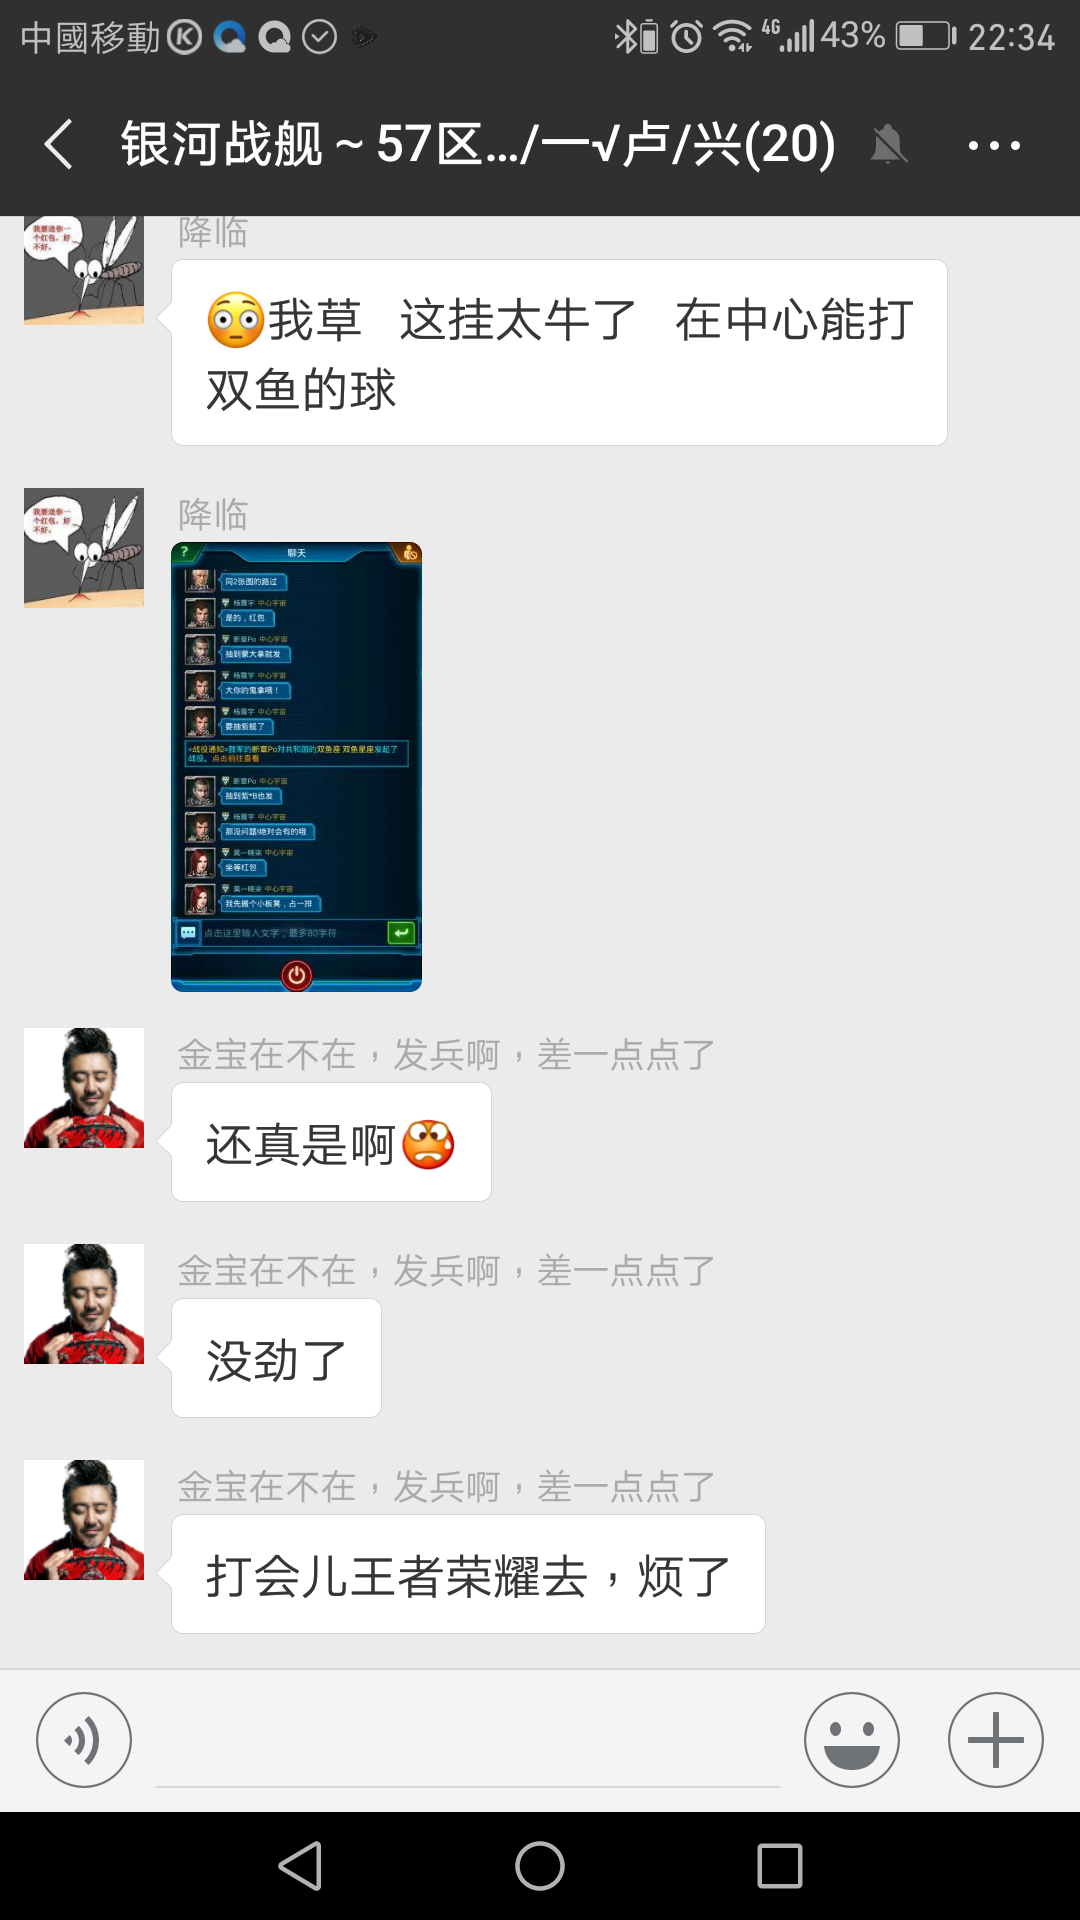 Screenshot_20180915-223437.png